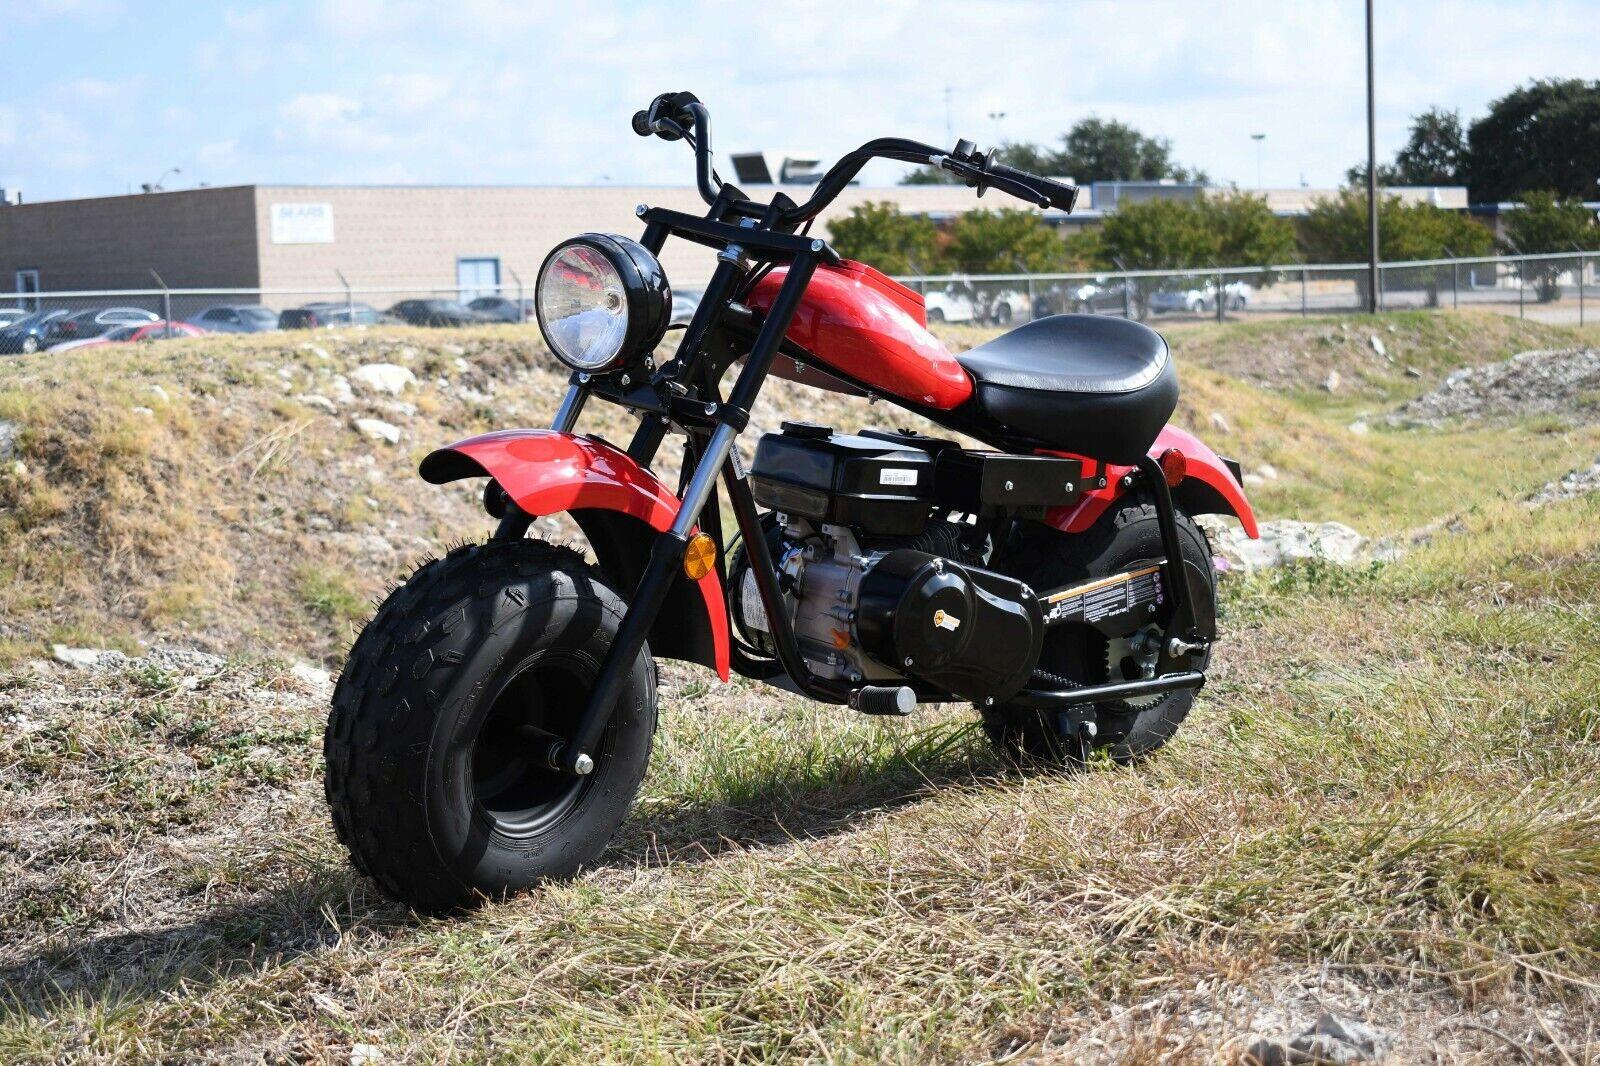 MASSIMO MB200 SUPERSIZED 196cc MINI BIKE MOTORCYCLE - RED